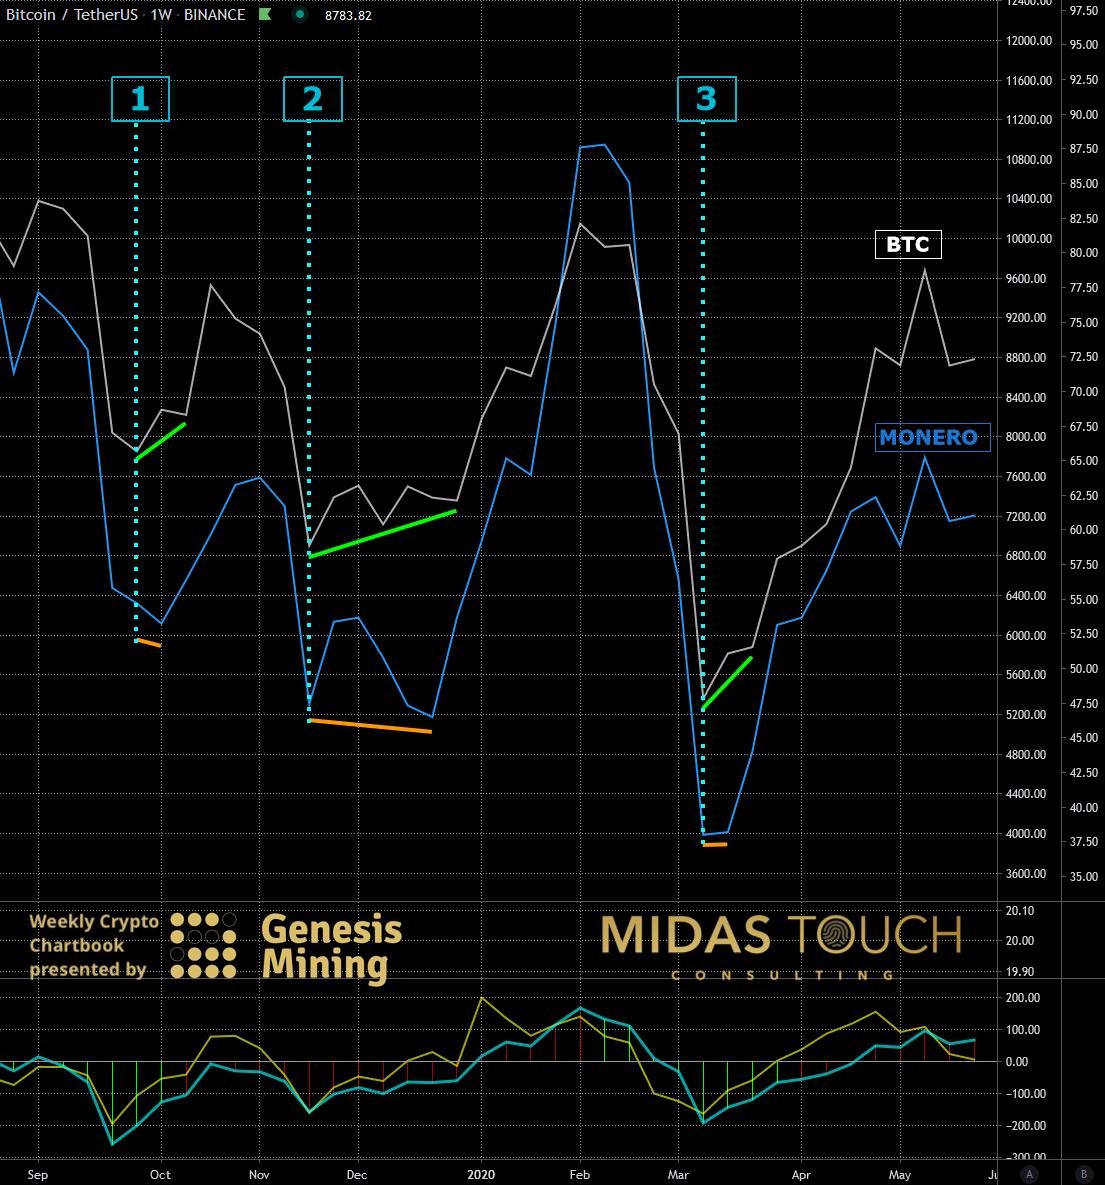 BTC-USDT versus XMR-USDT, weekly chart as of May 25th, 2020